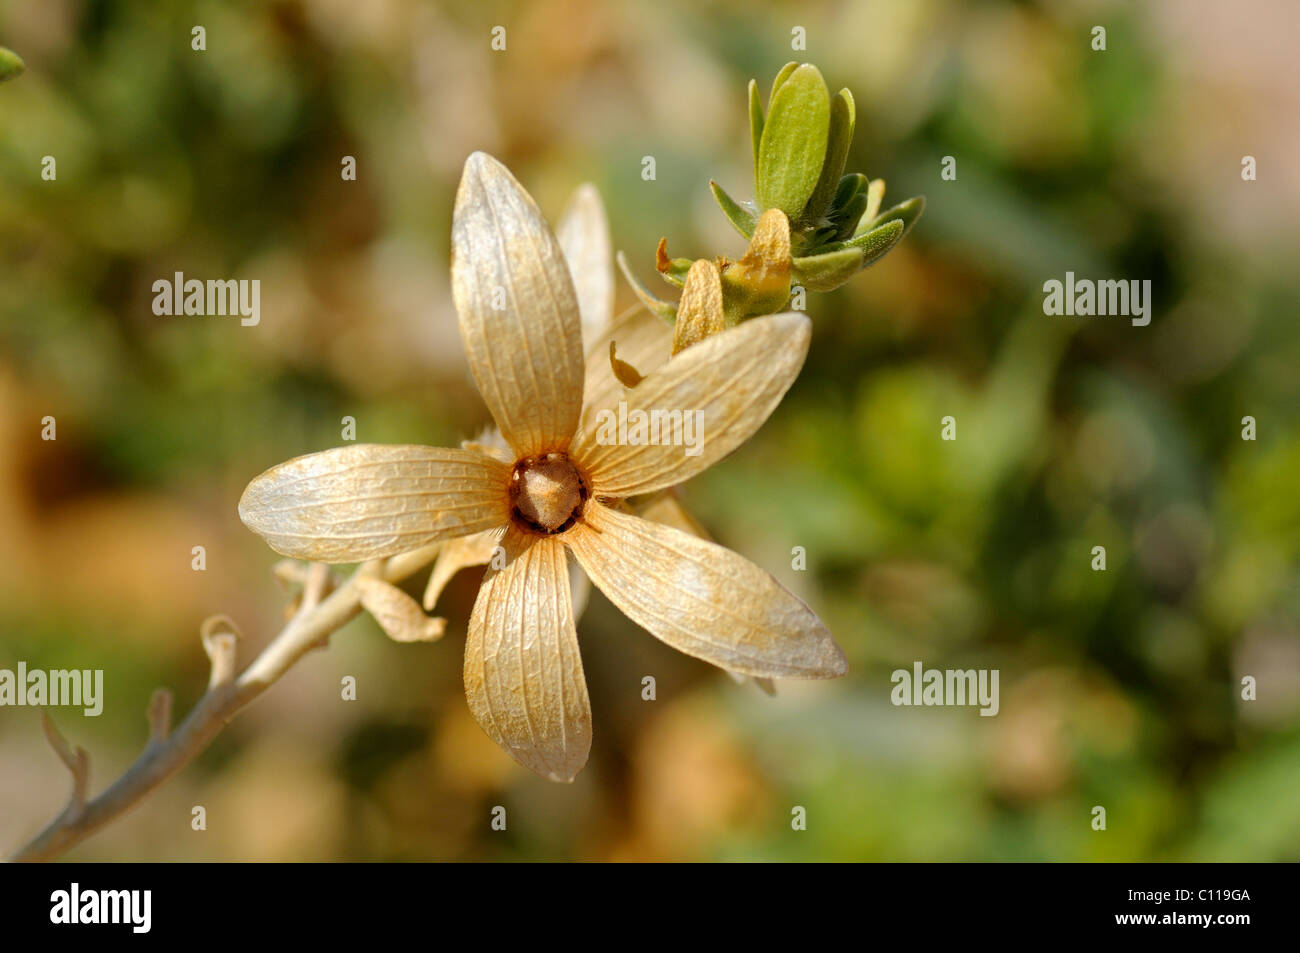 Wahlenbergia thunbergiana, Richtersveld National Park, South Africa - Stock Image